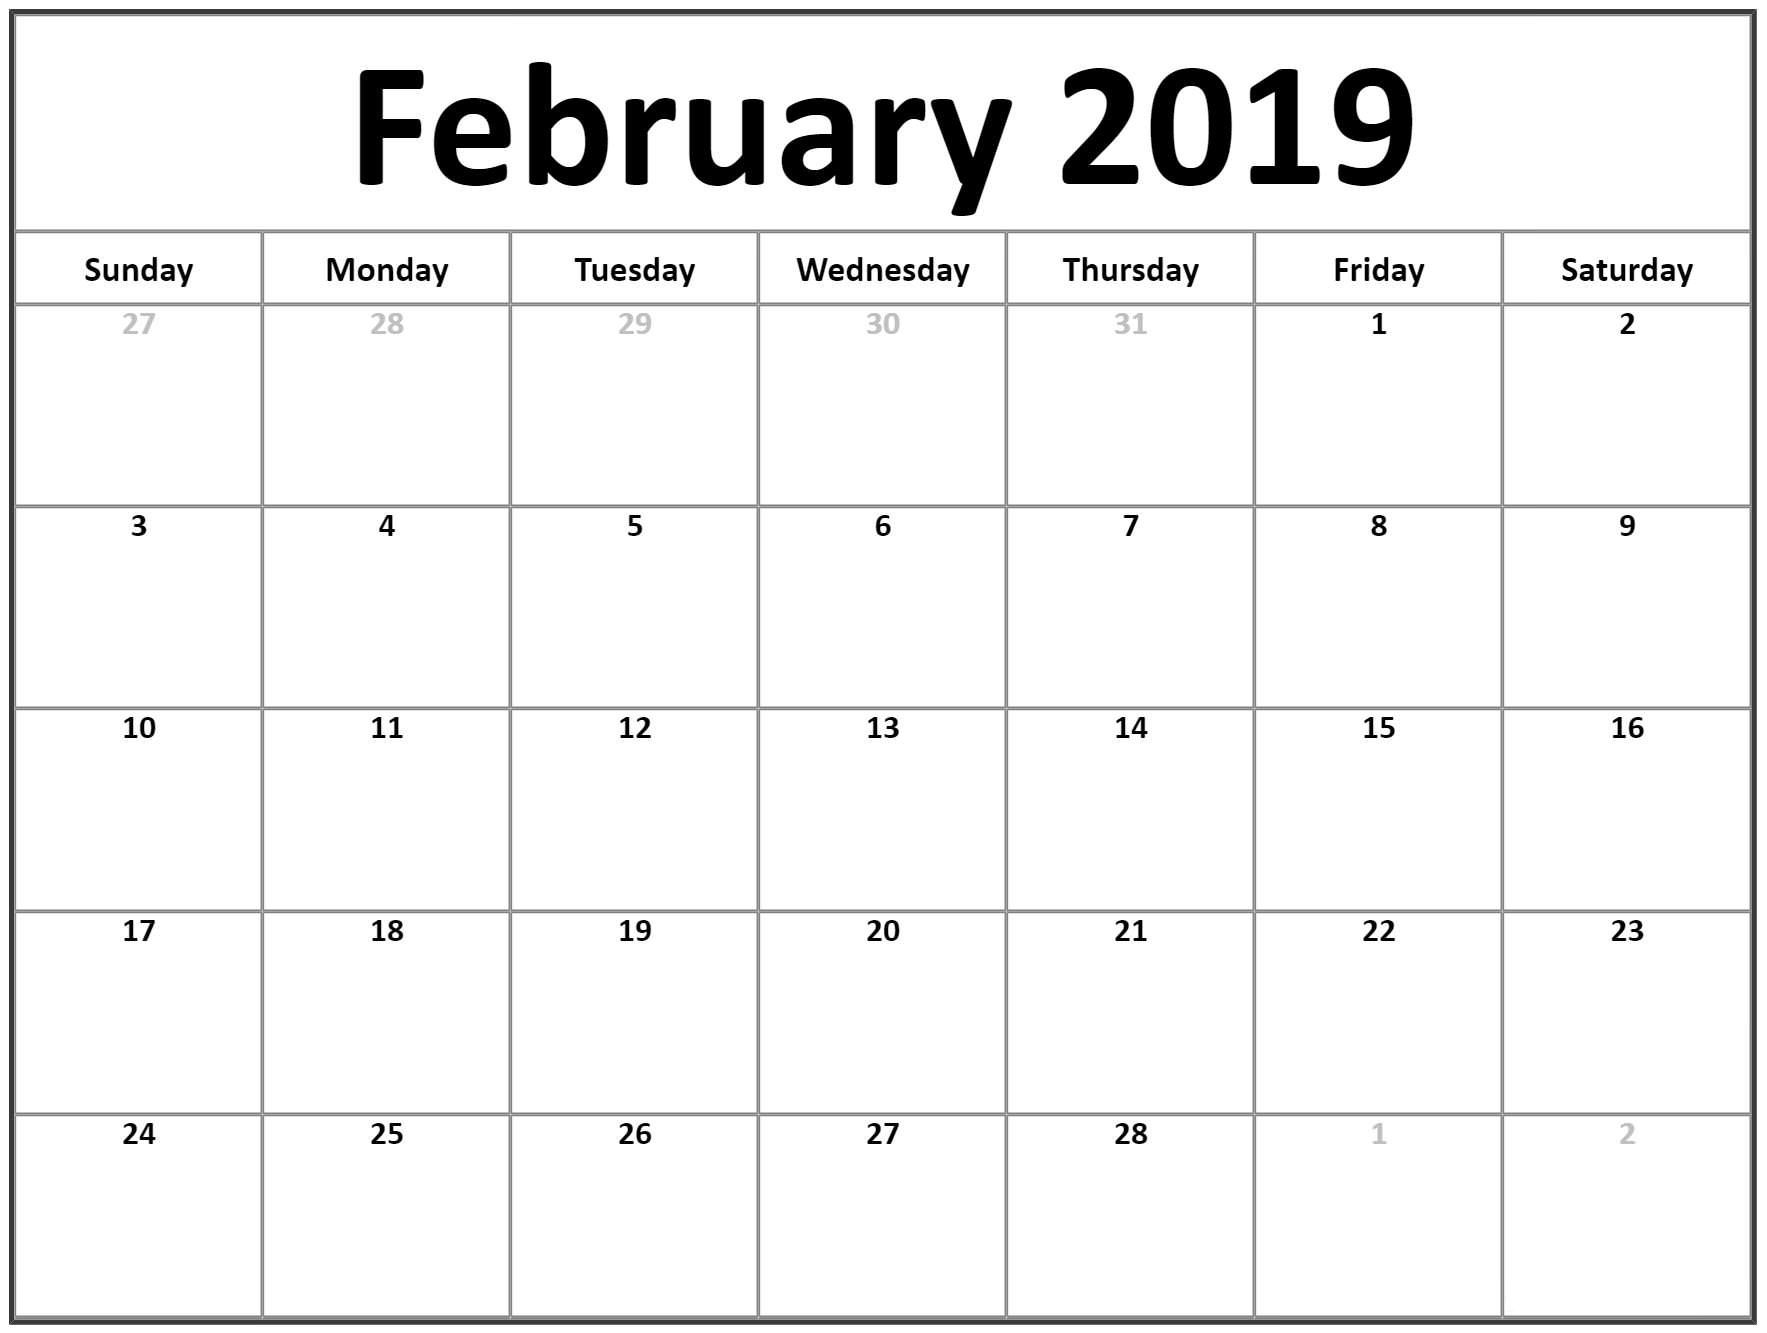 February Calendar 2019 For Office | February Calendar 2019